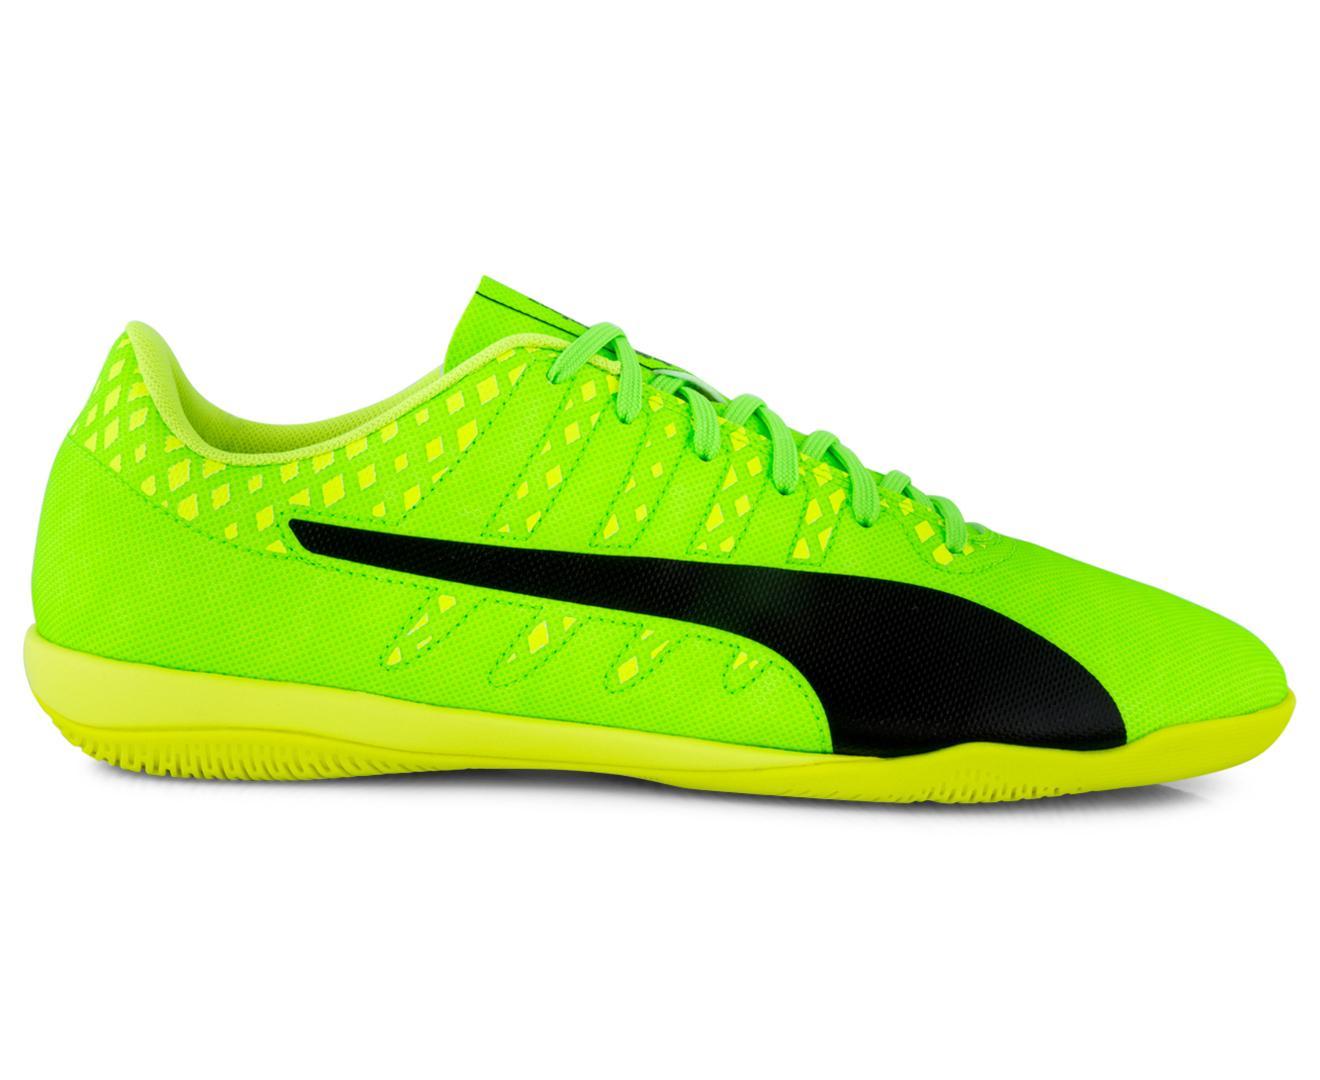 Buy Puma Men S Evopower Vigor 4 It Indoor Football Shoe Green Black Yellow Intl Puma